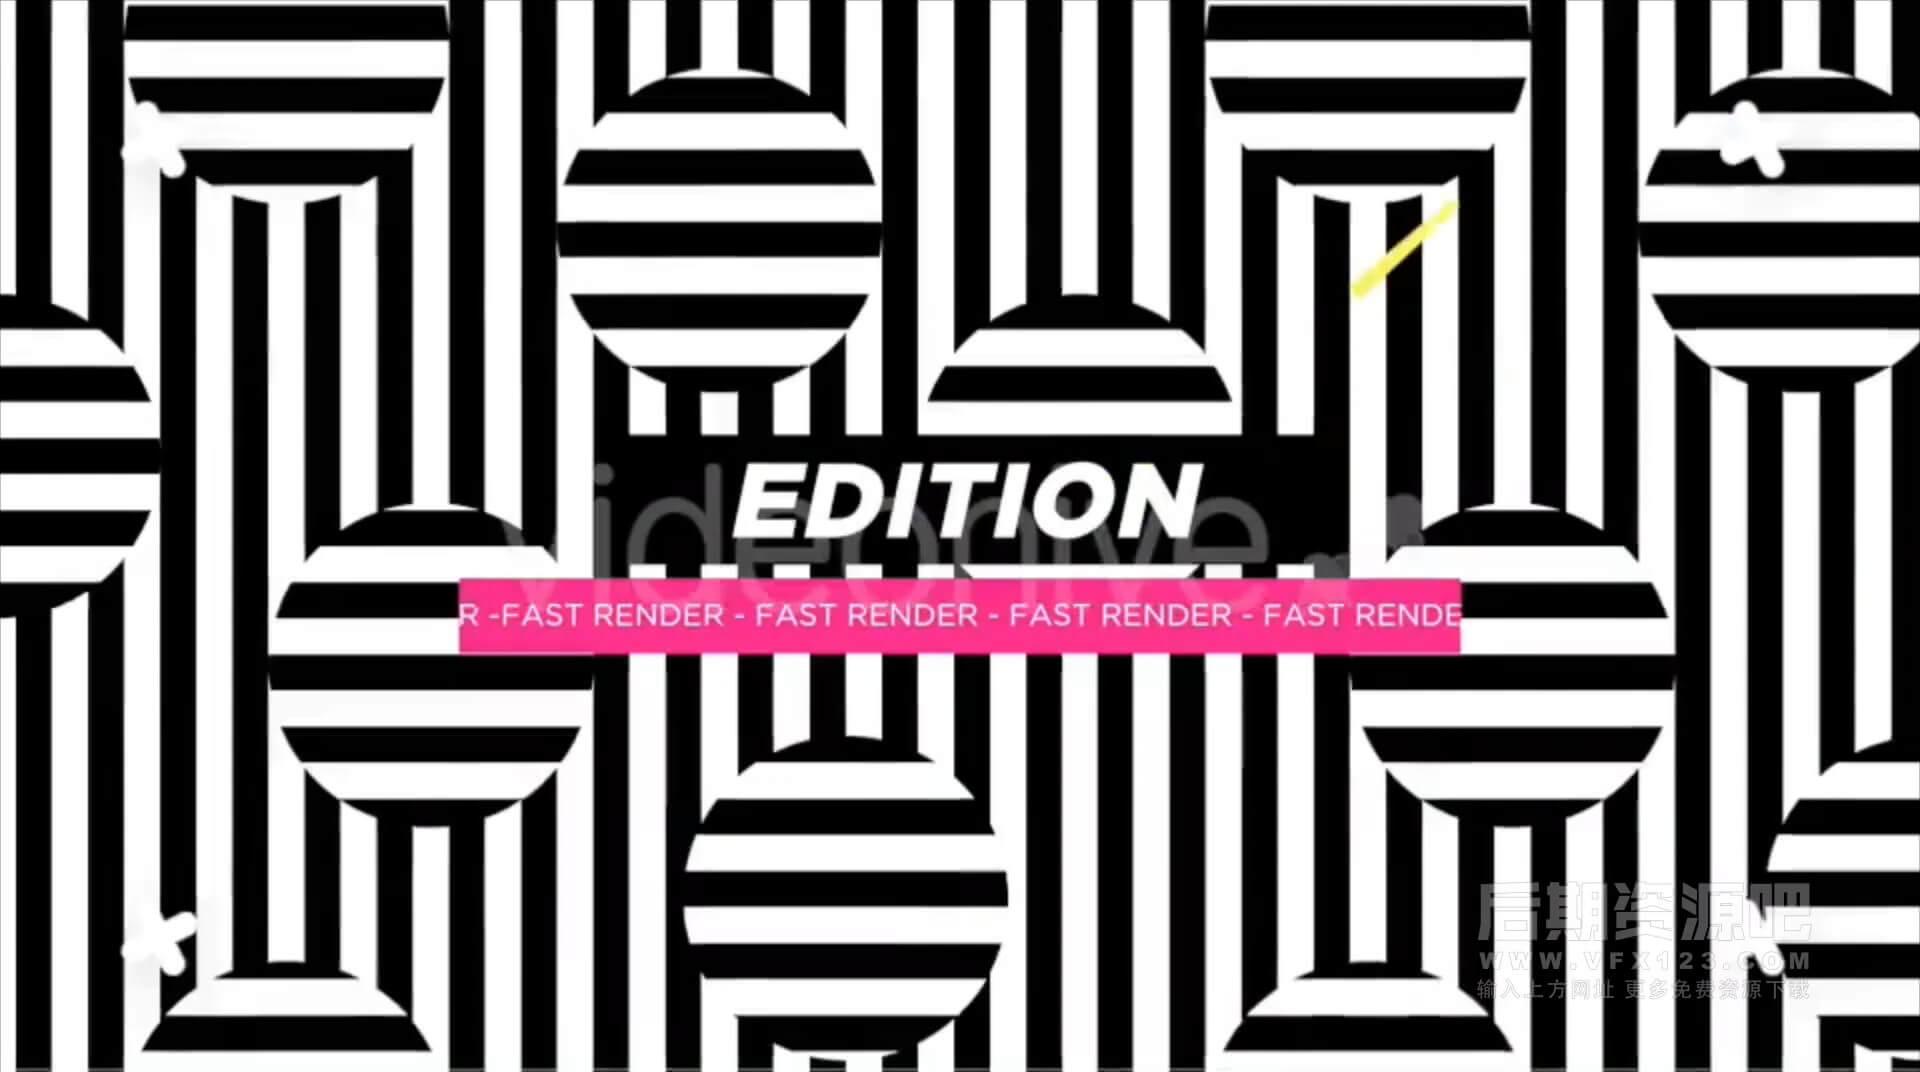 FCPX插件 10组杂志封面风格大标题片头制作模板 Titles Collection